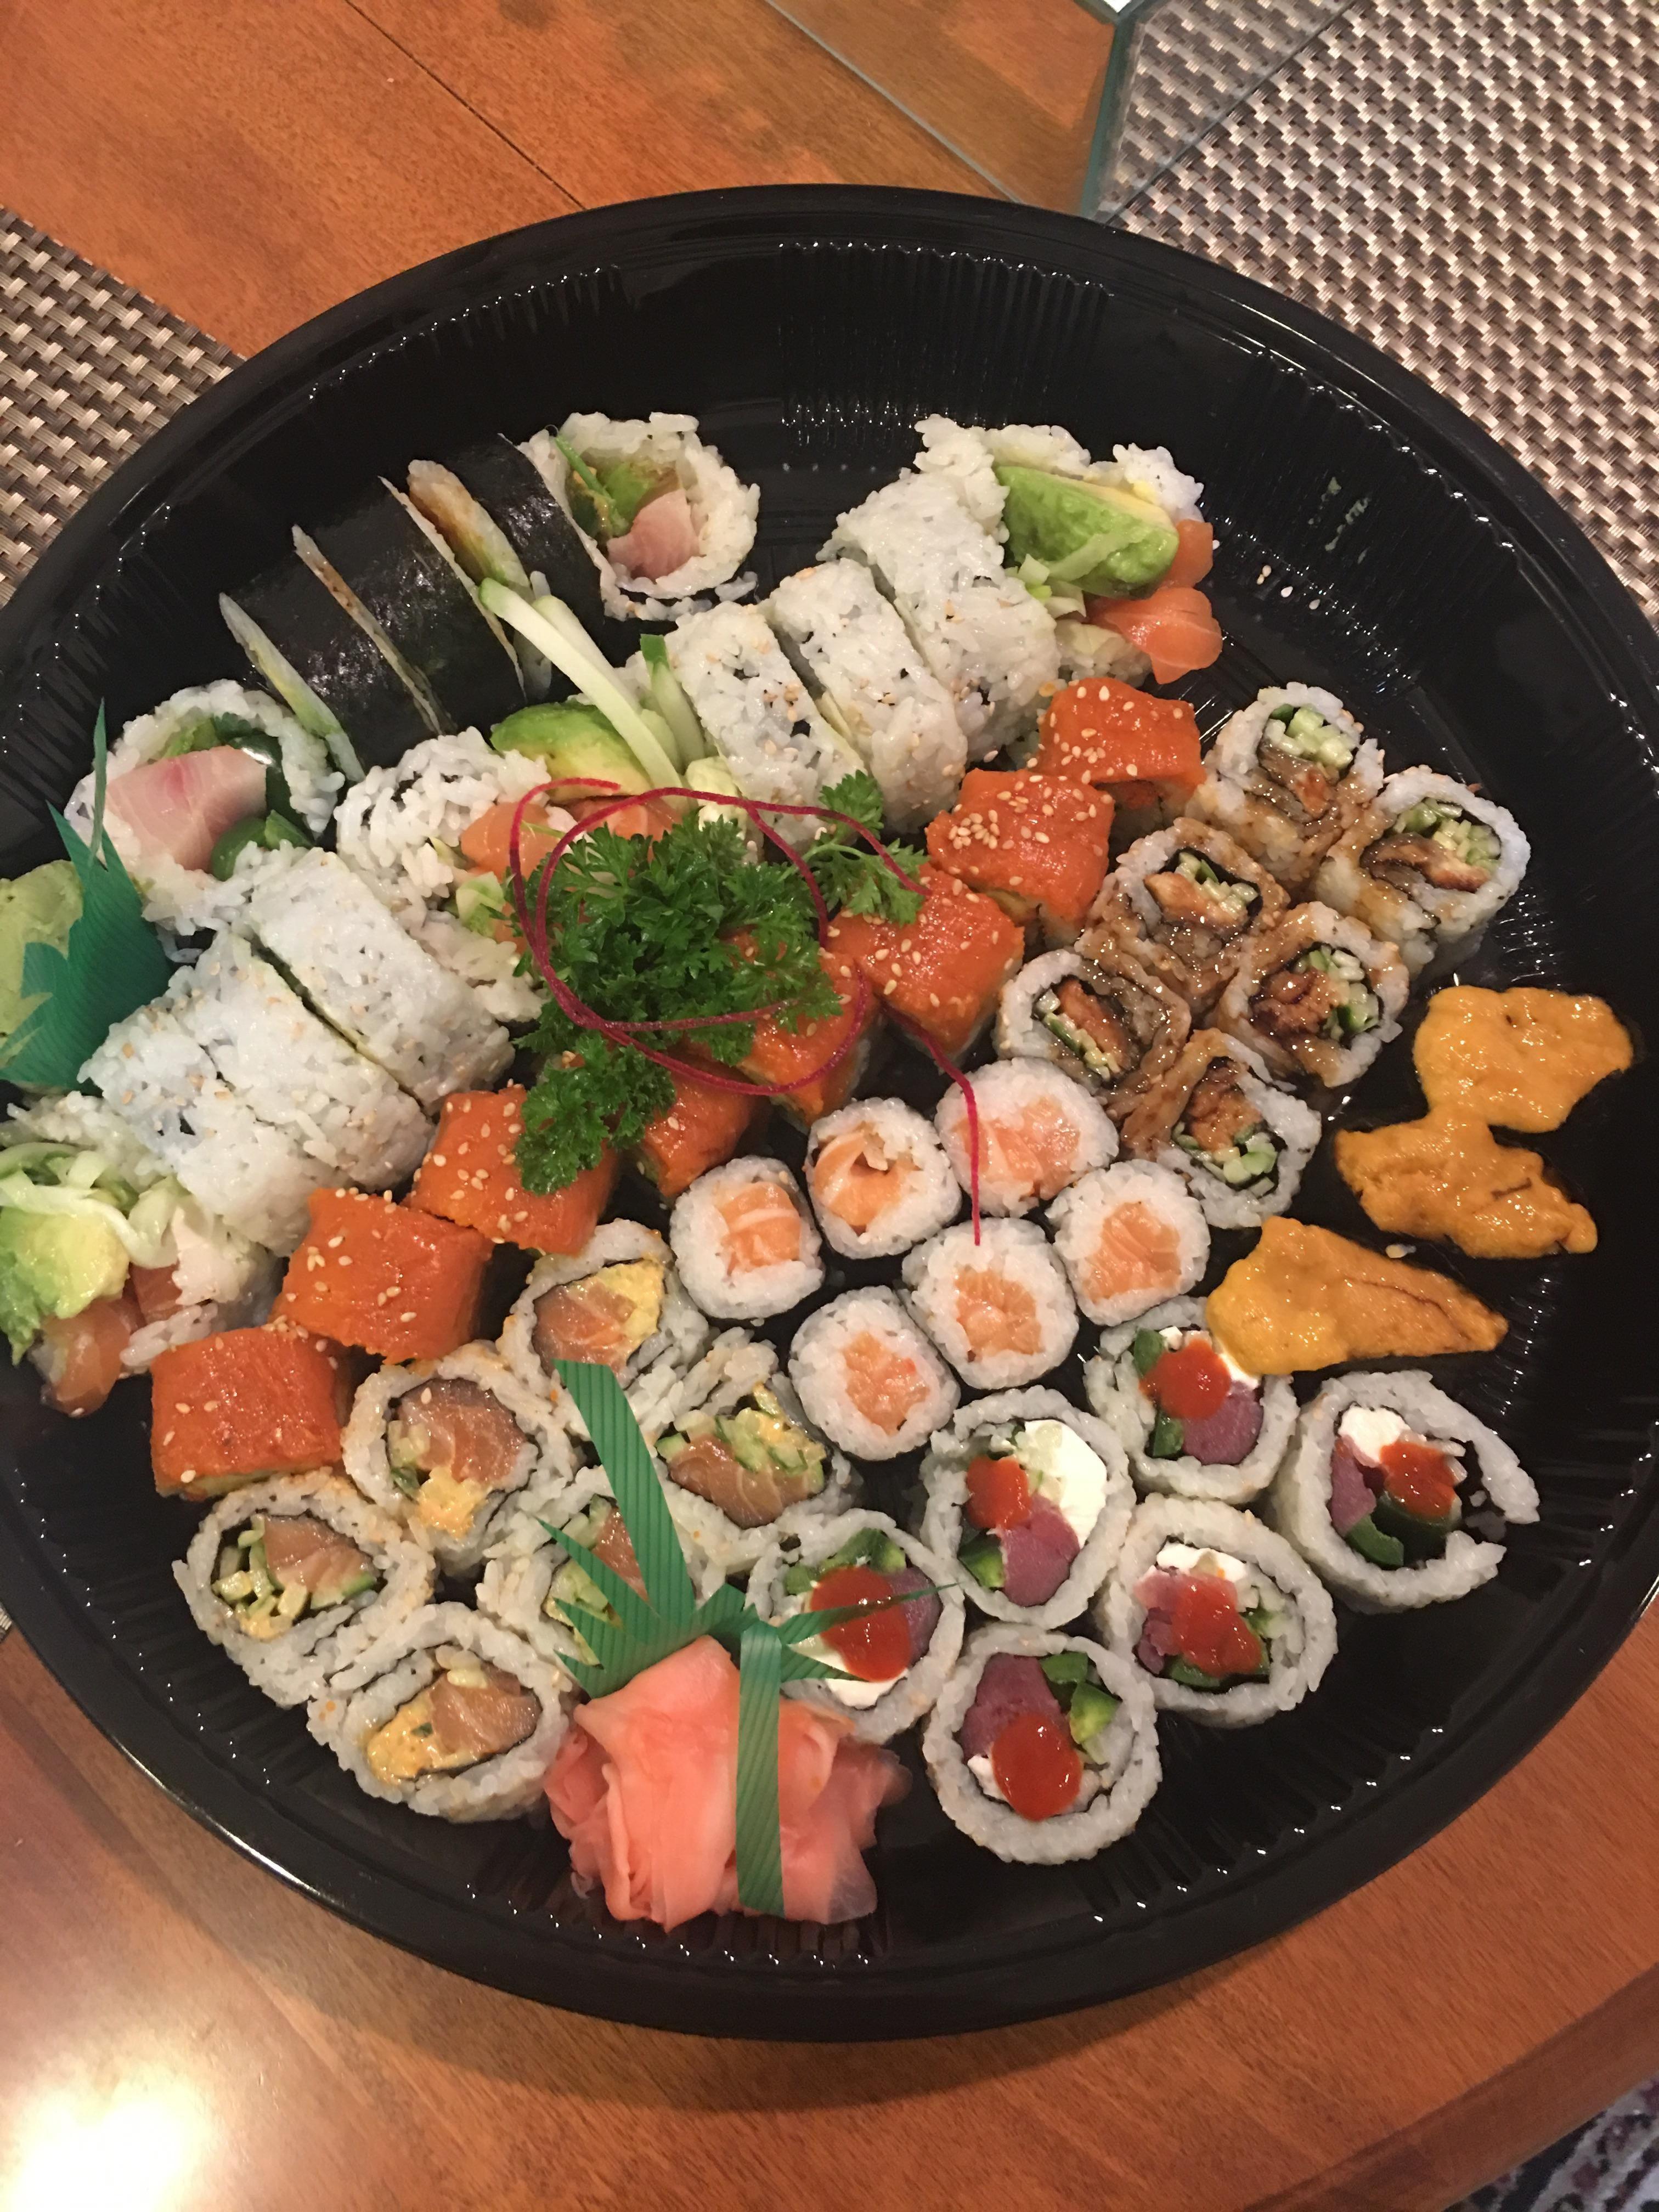 [+] Arcadia - Sushi And Chinese Food Near Me